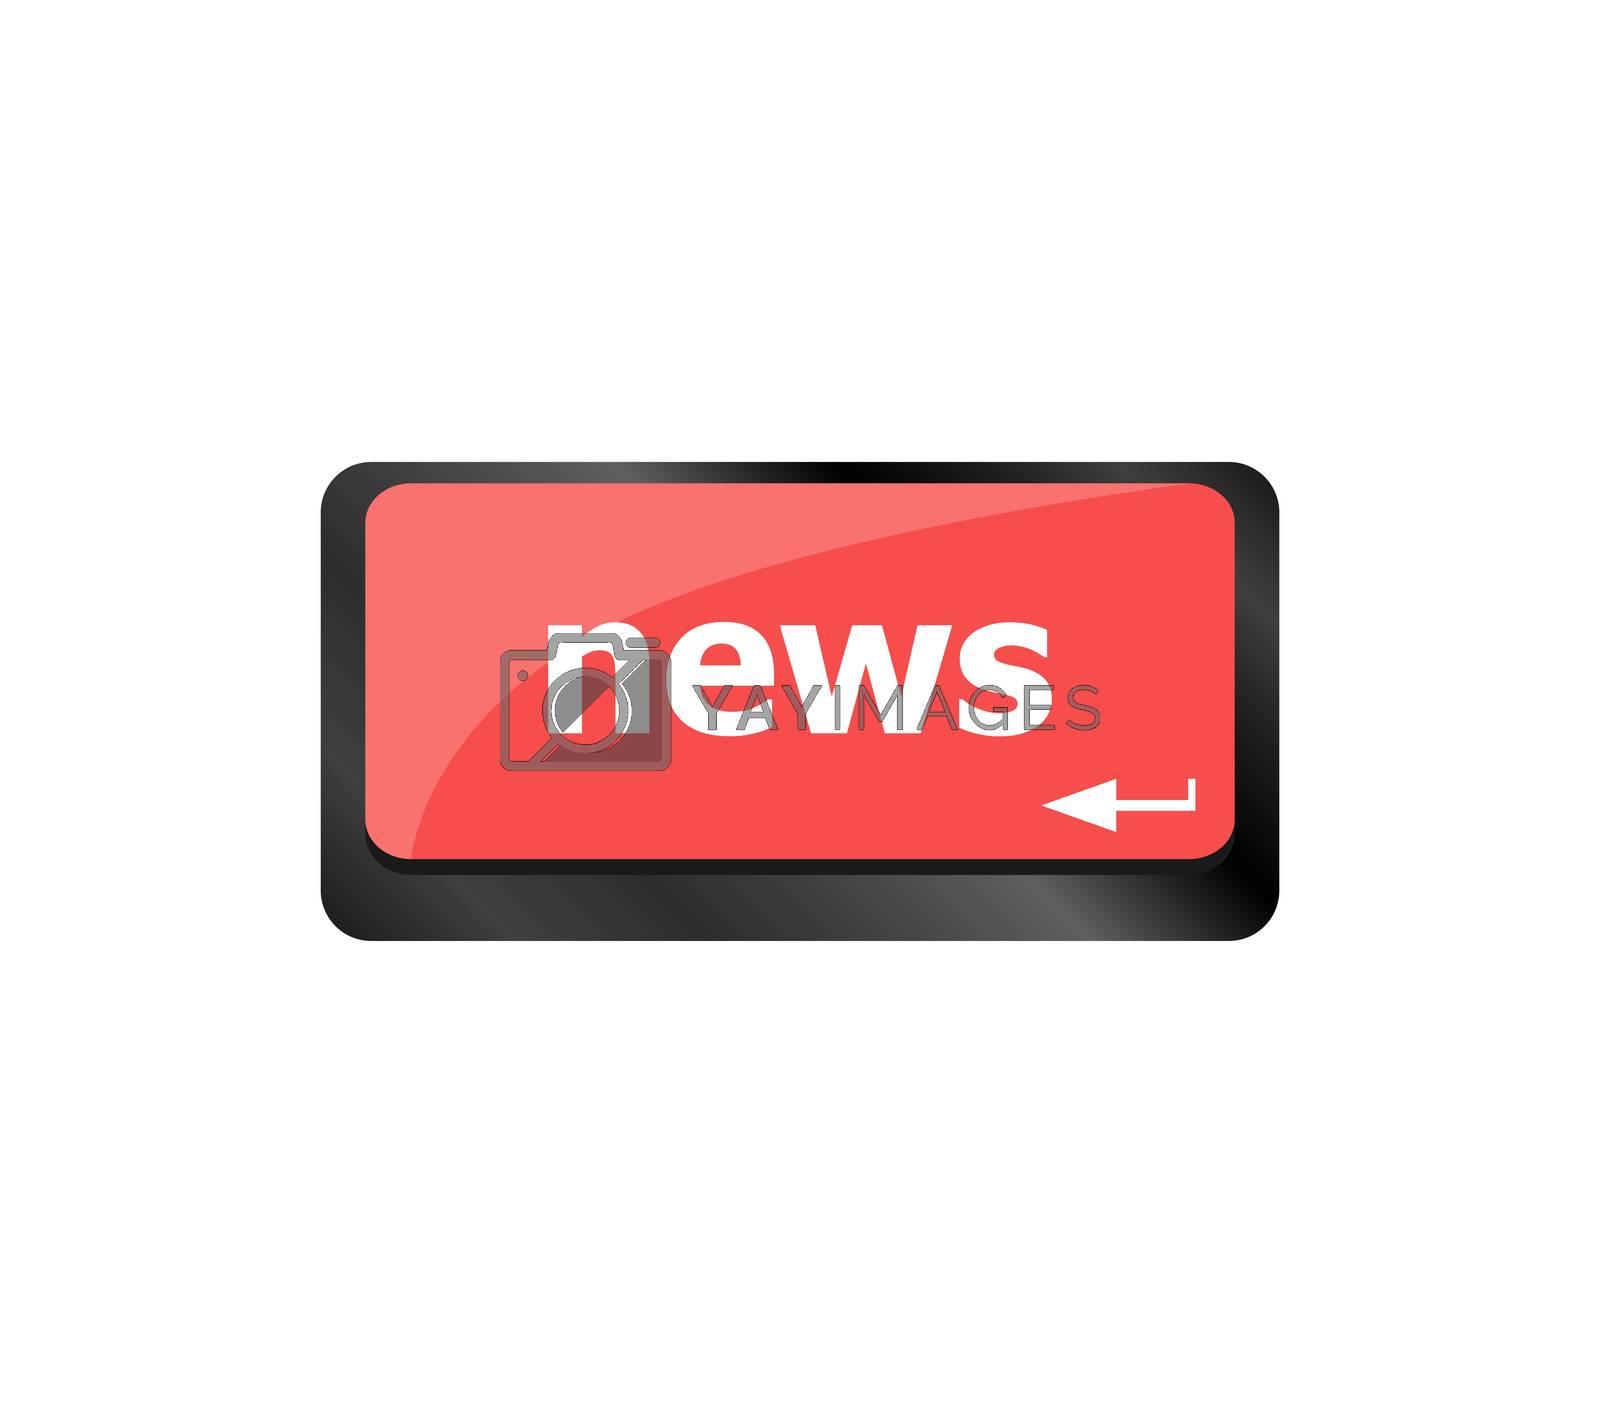 News text on a button computer keyboard keys